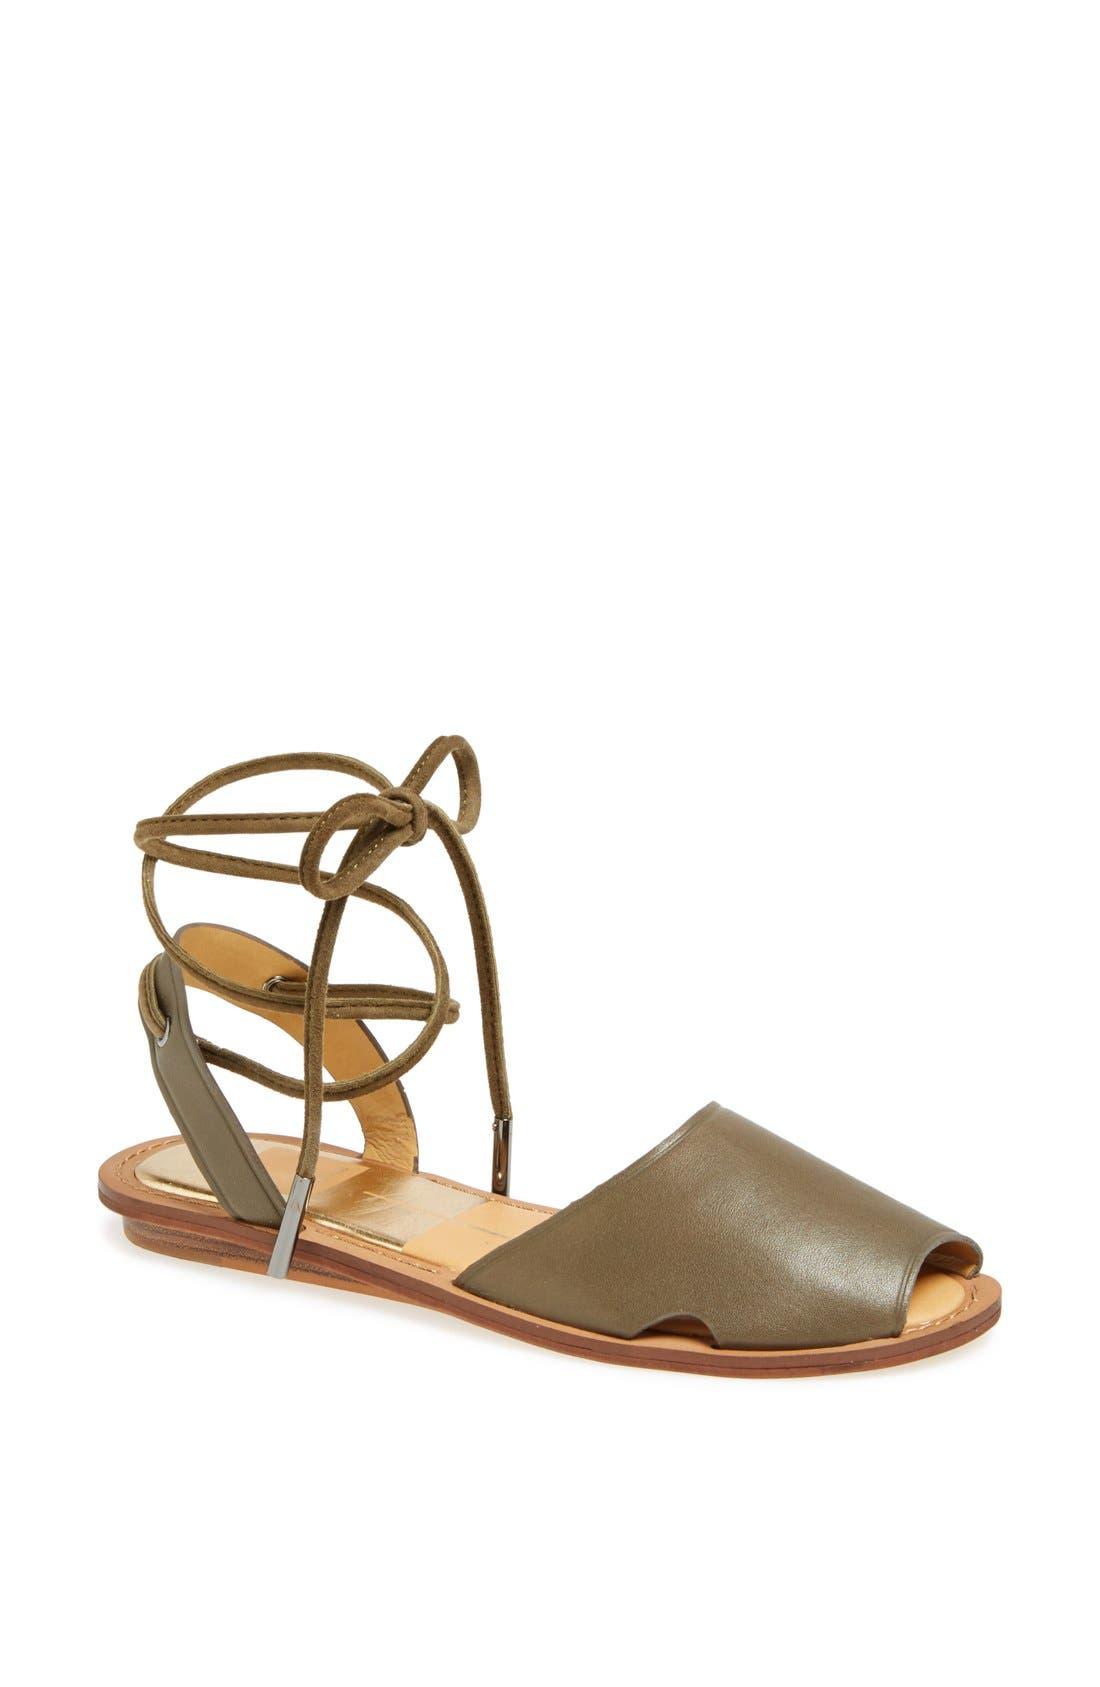 Alternate Image 1 Selected - Dolce Vita 'Damalis' Sandal